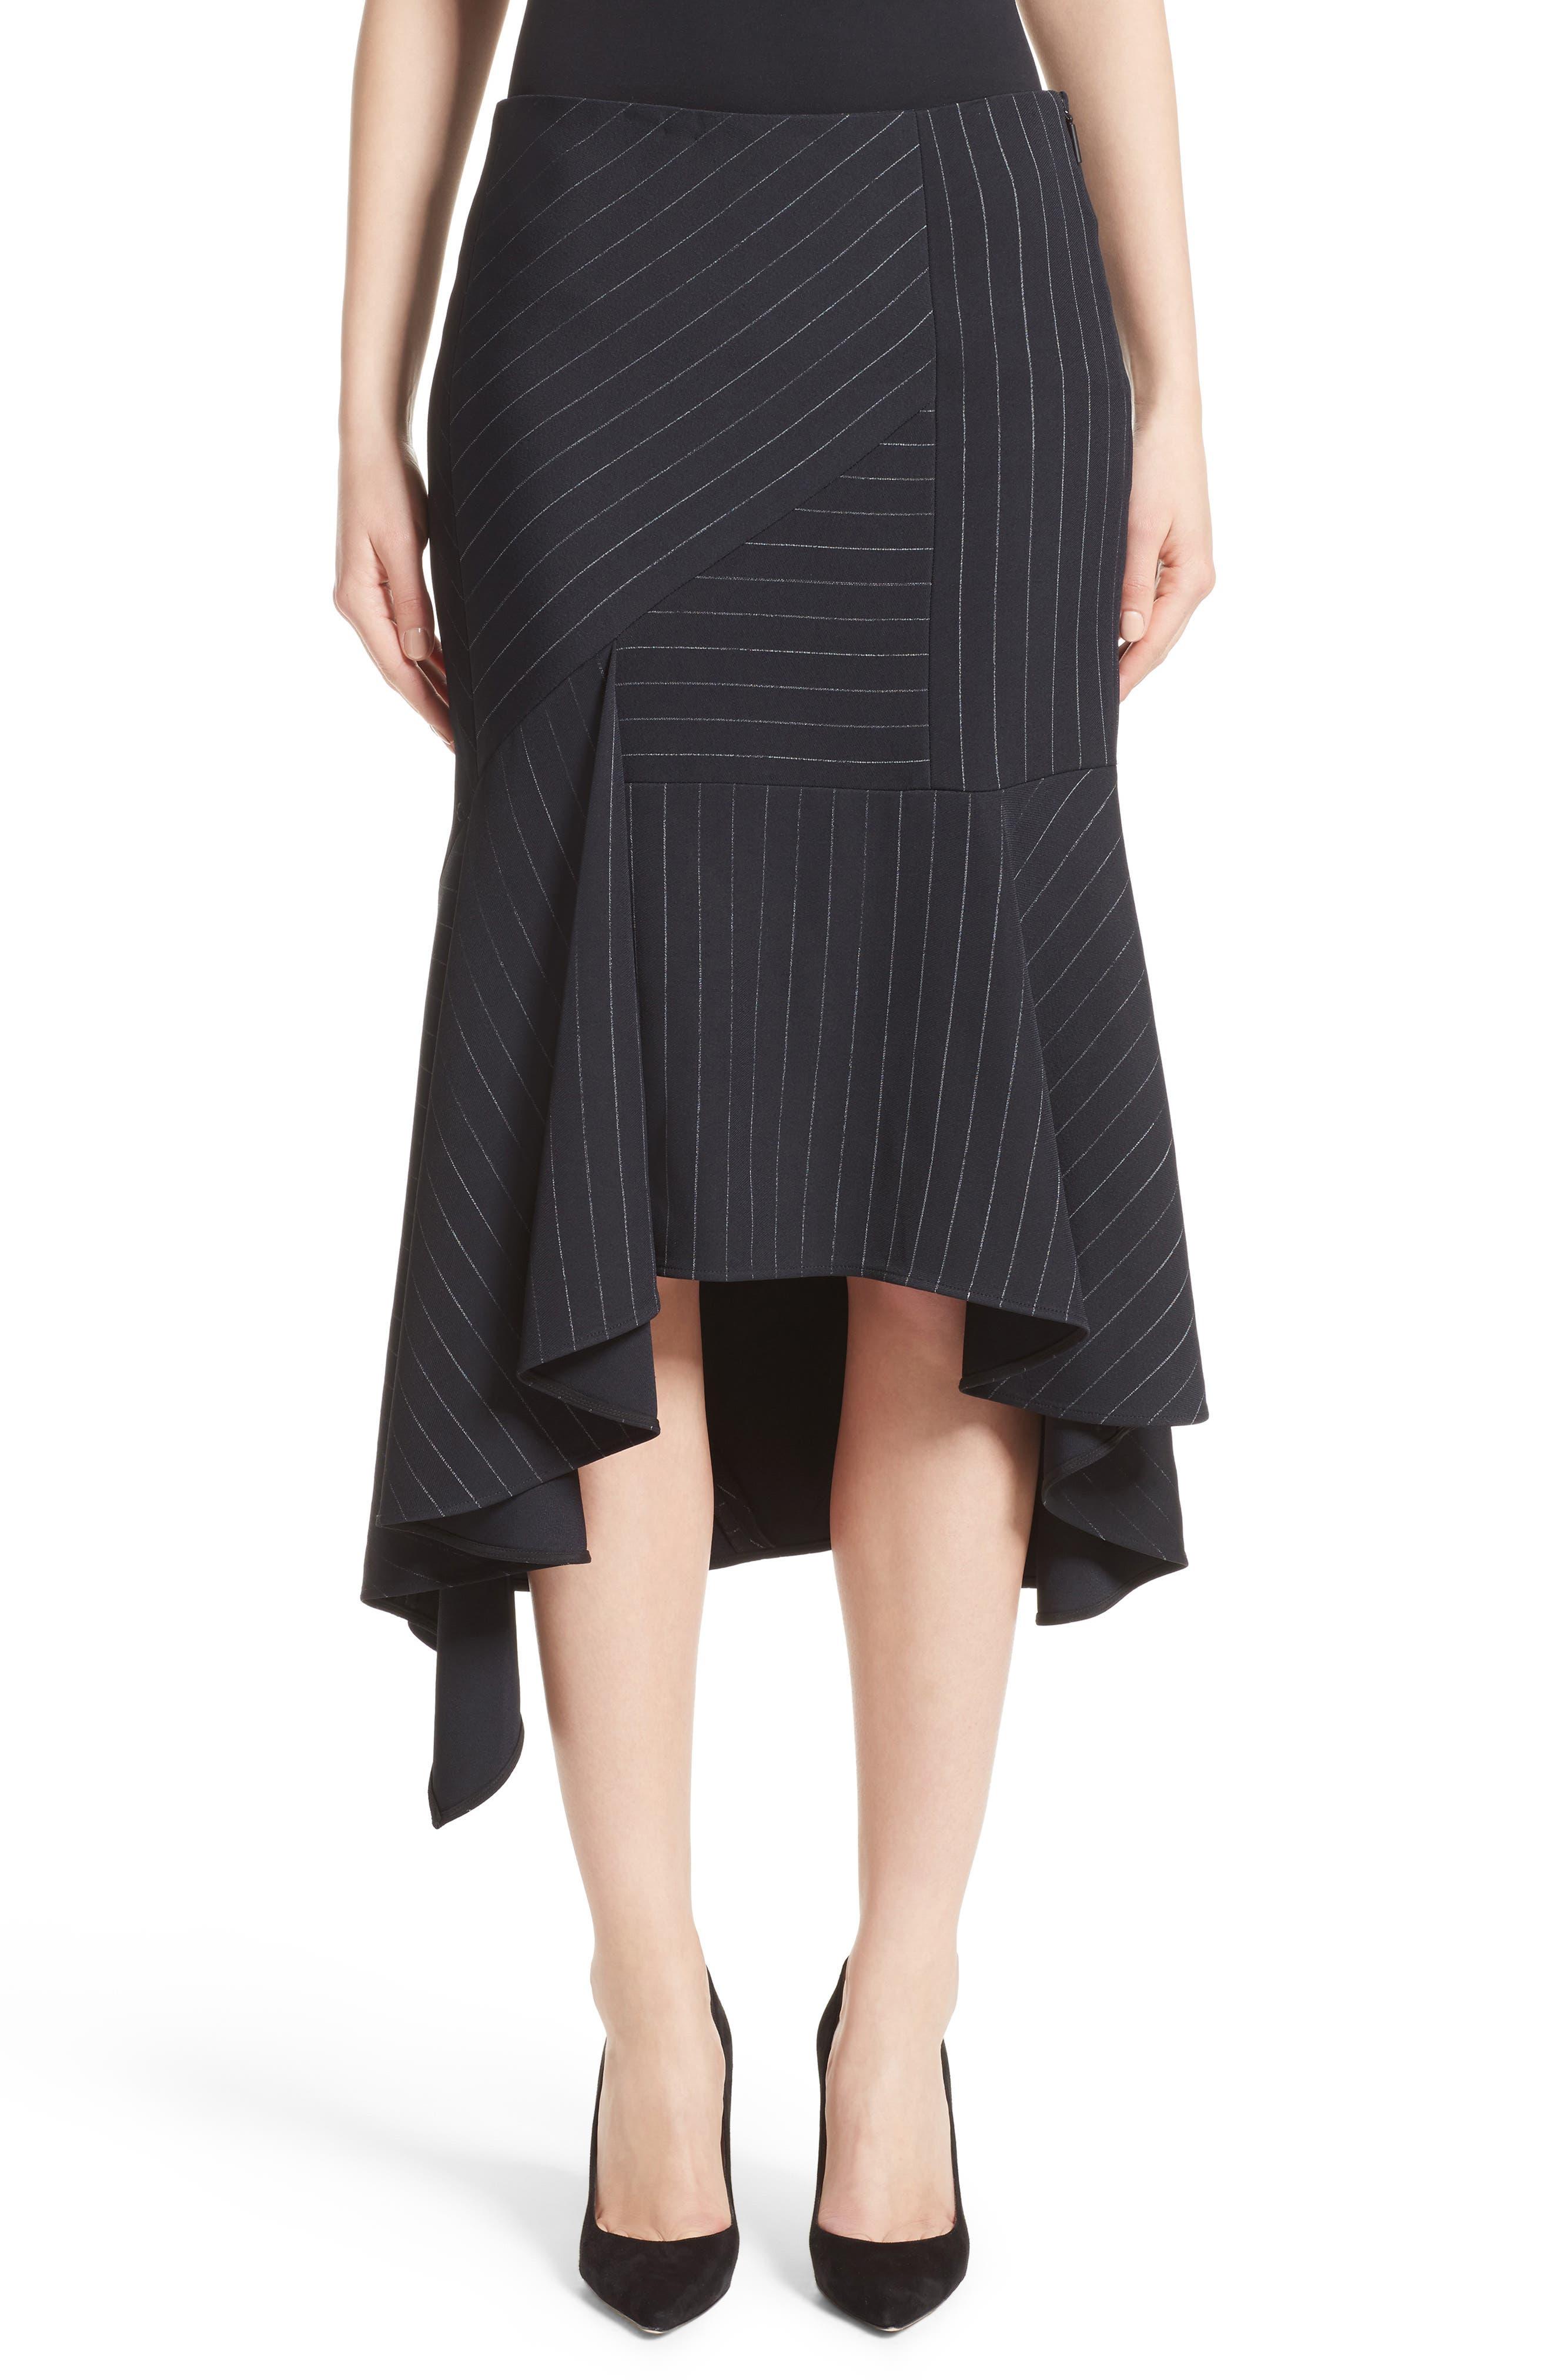 Jason Wu Pinstripe Stretch Asymmetrical Skirt